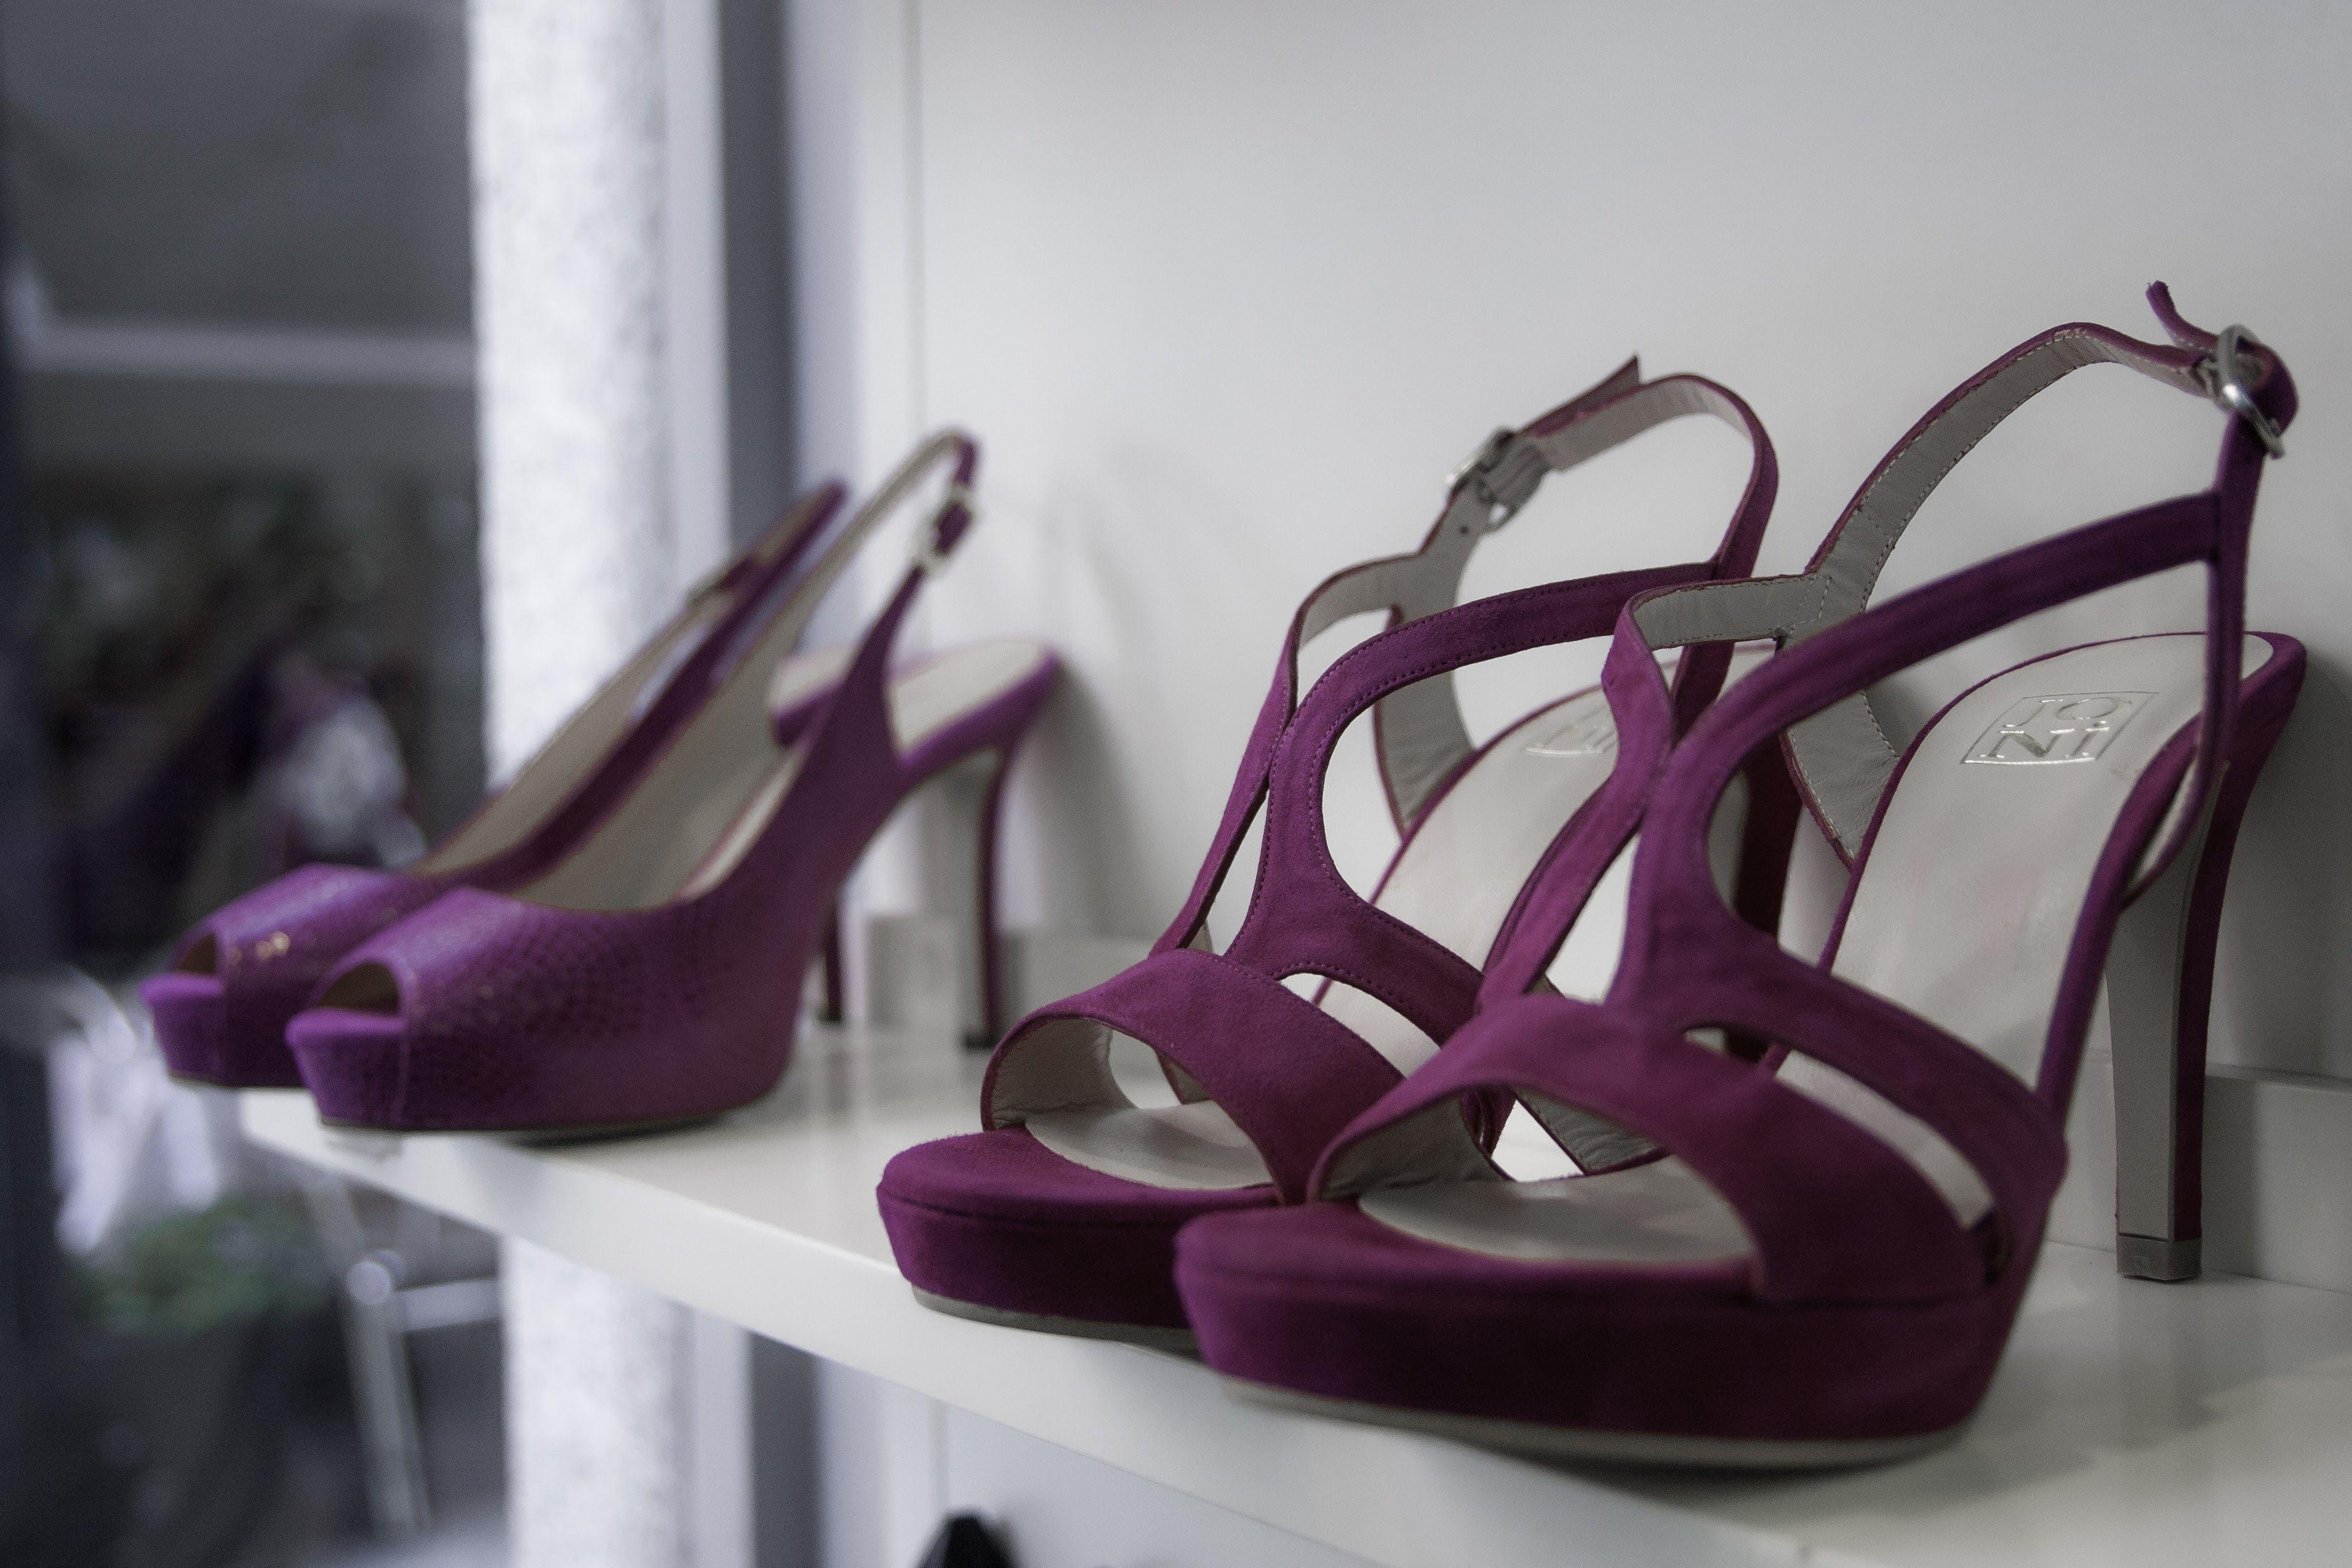 Foto 3 de Calzado para mujer en  | Calzados Prietos